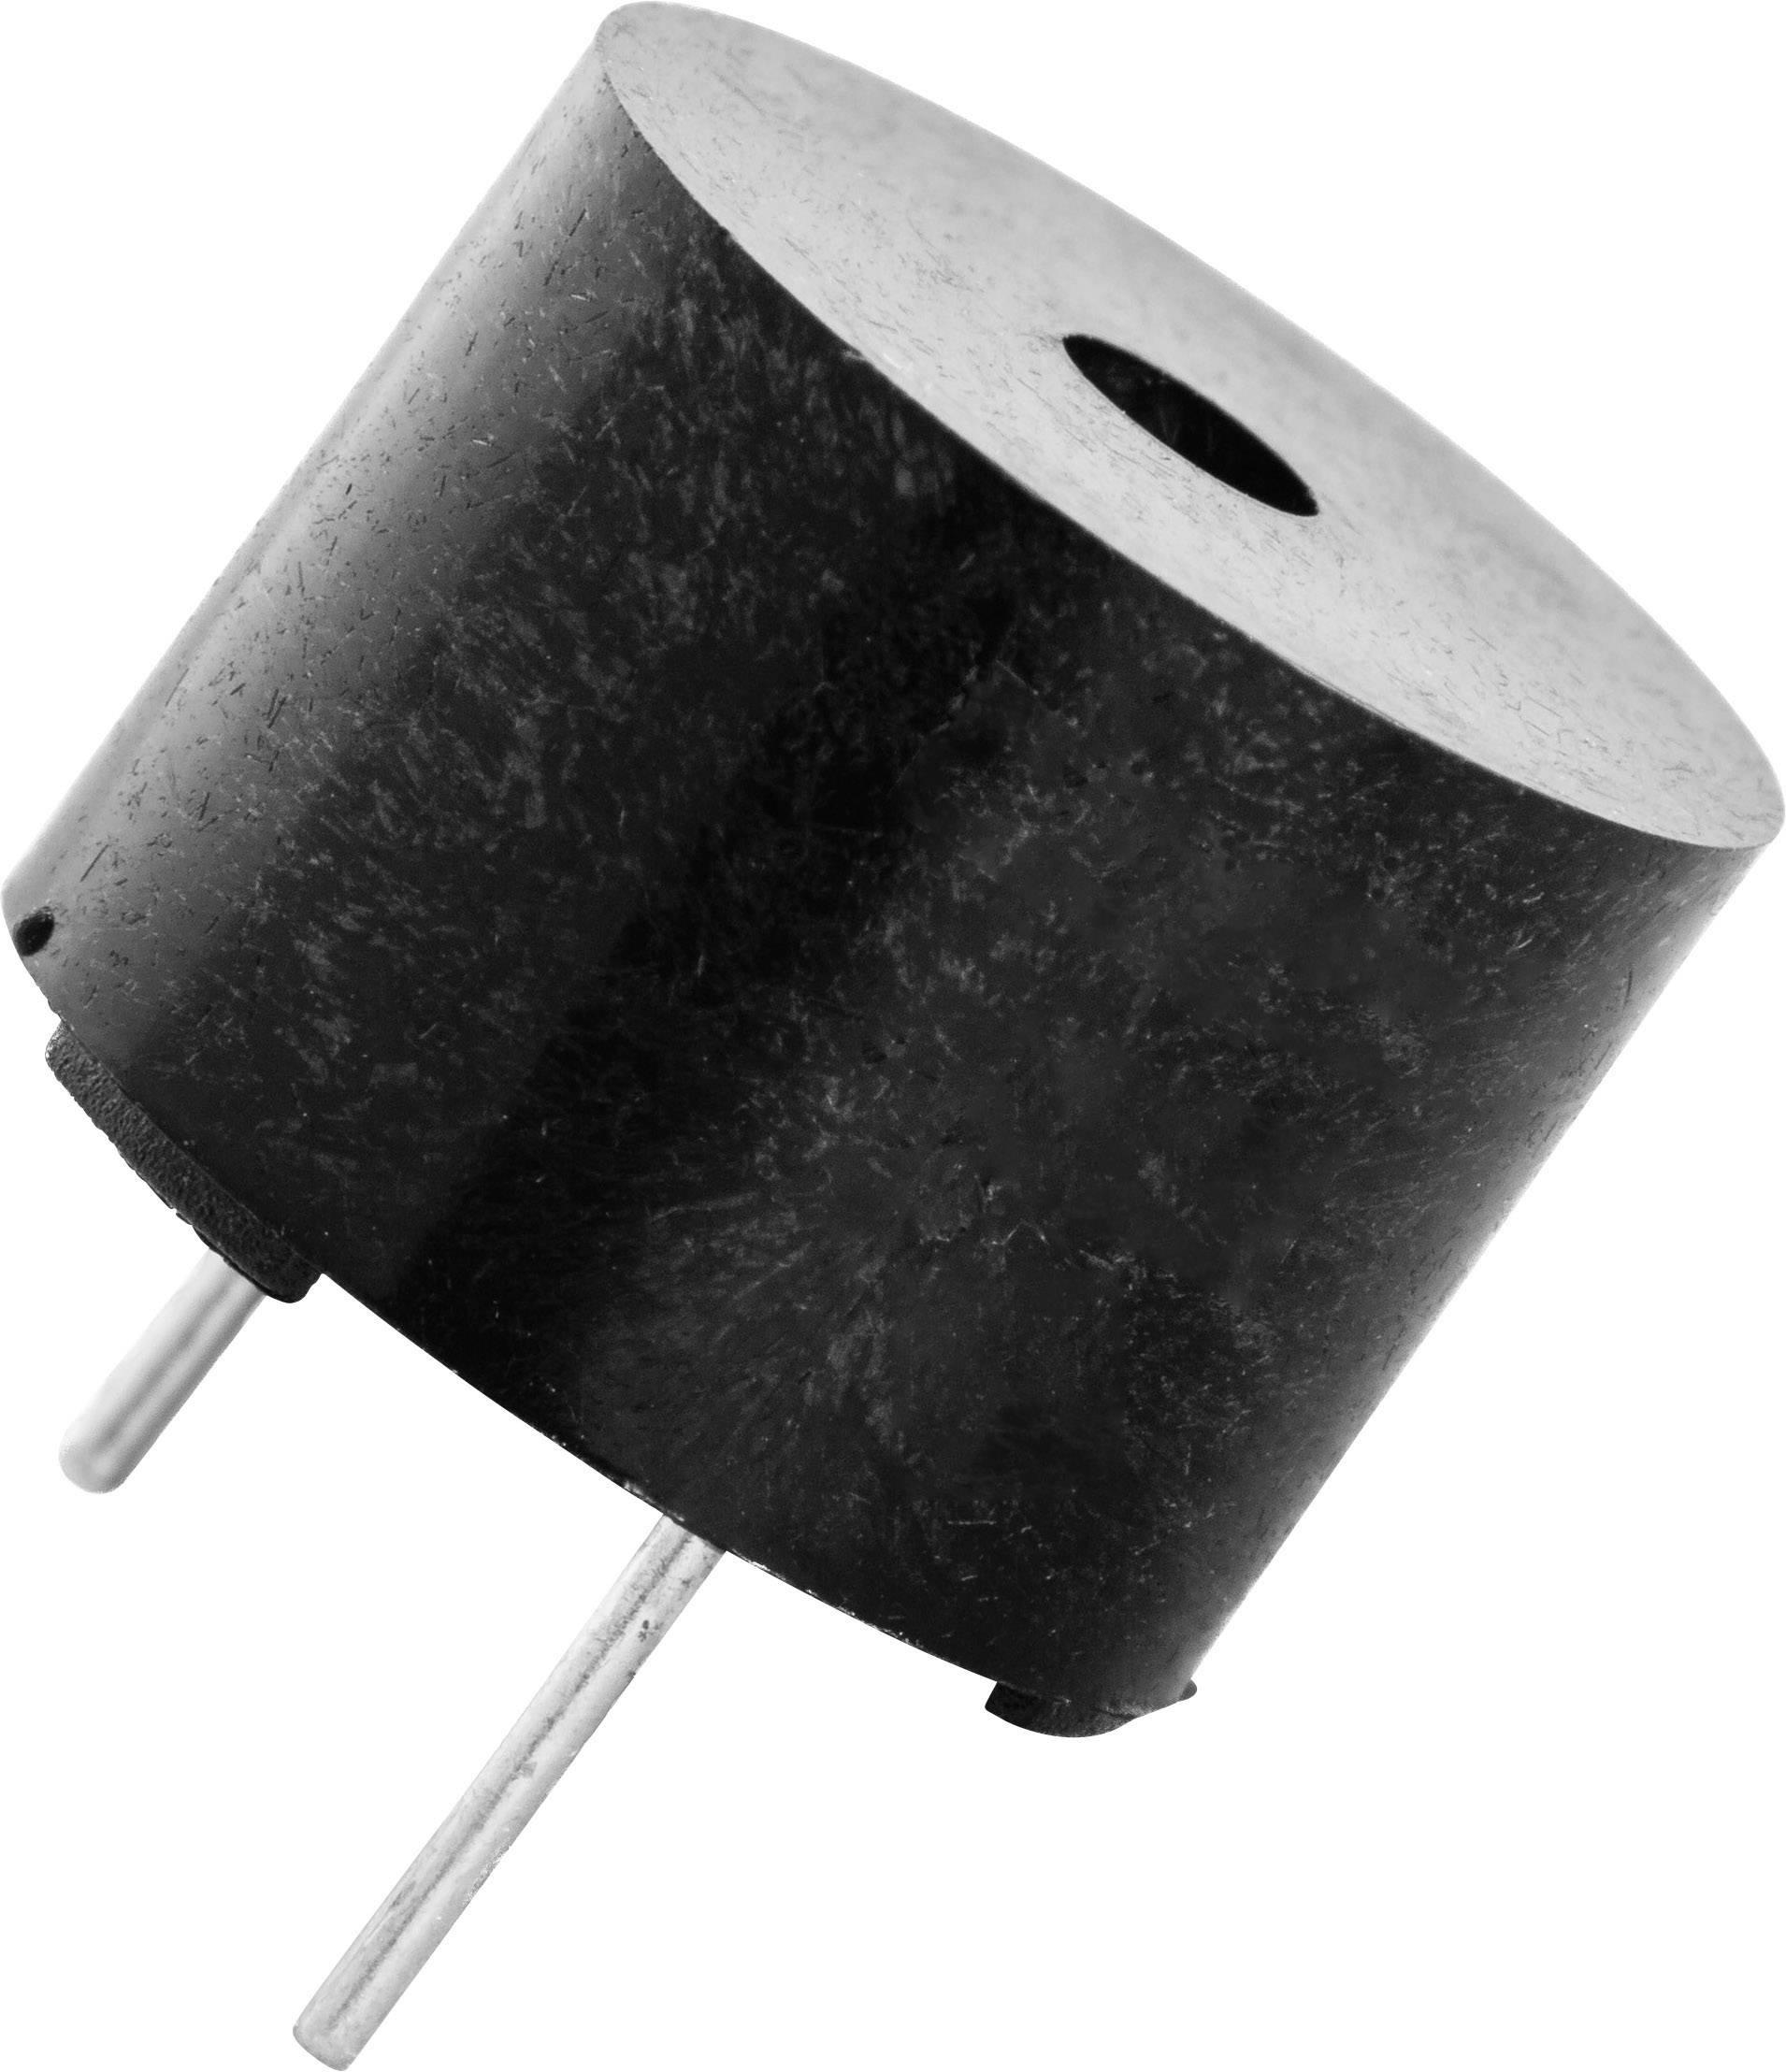 Vysílač signálu s elektronikousérie AL-60S